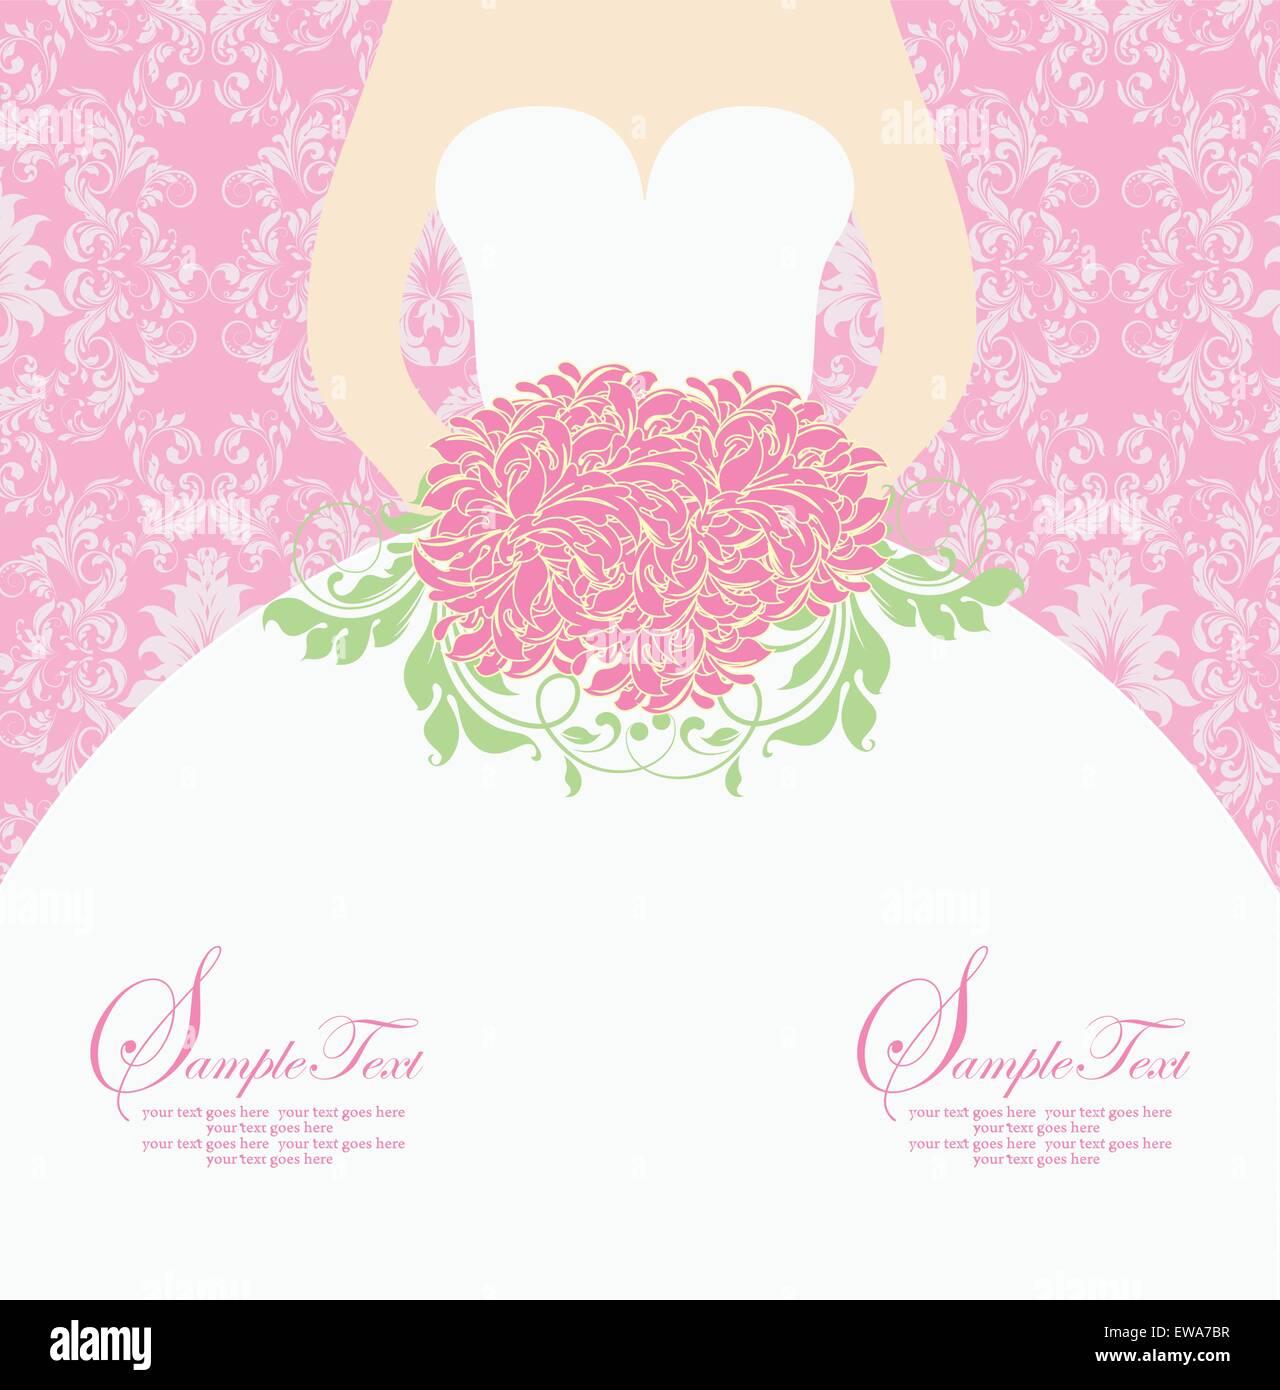 https www alamy com stock photo vintage wedding invitation card with ornate elegant retro abstract 84433211 html